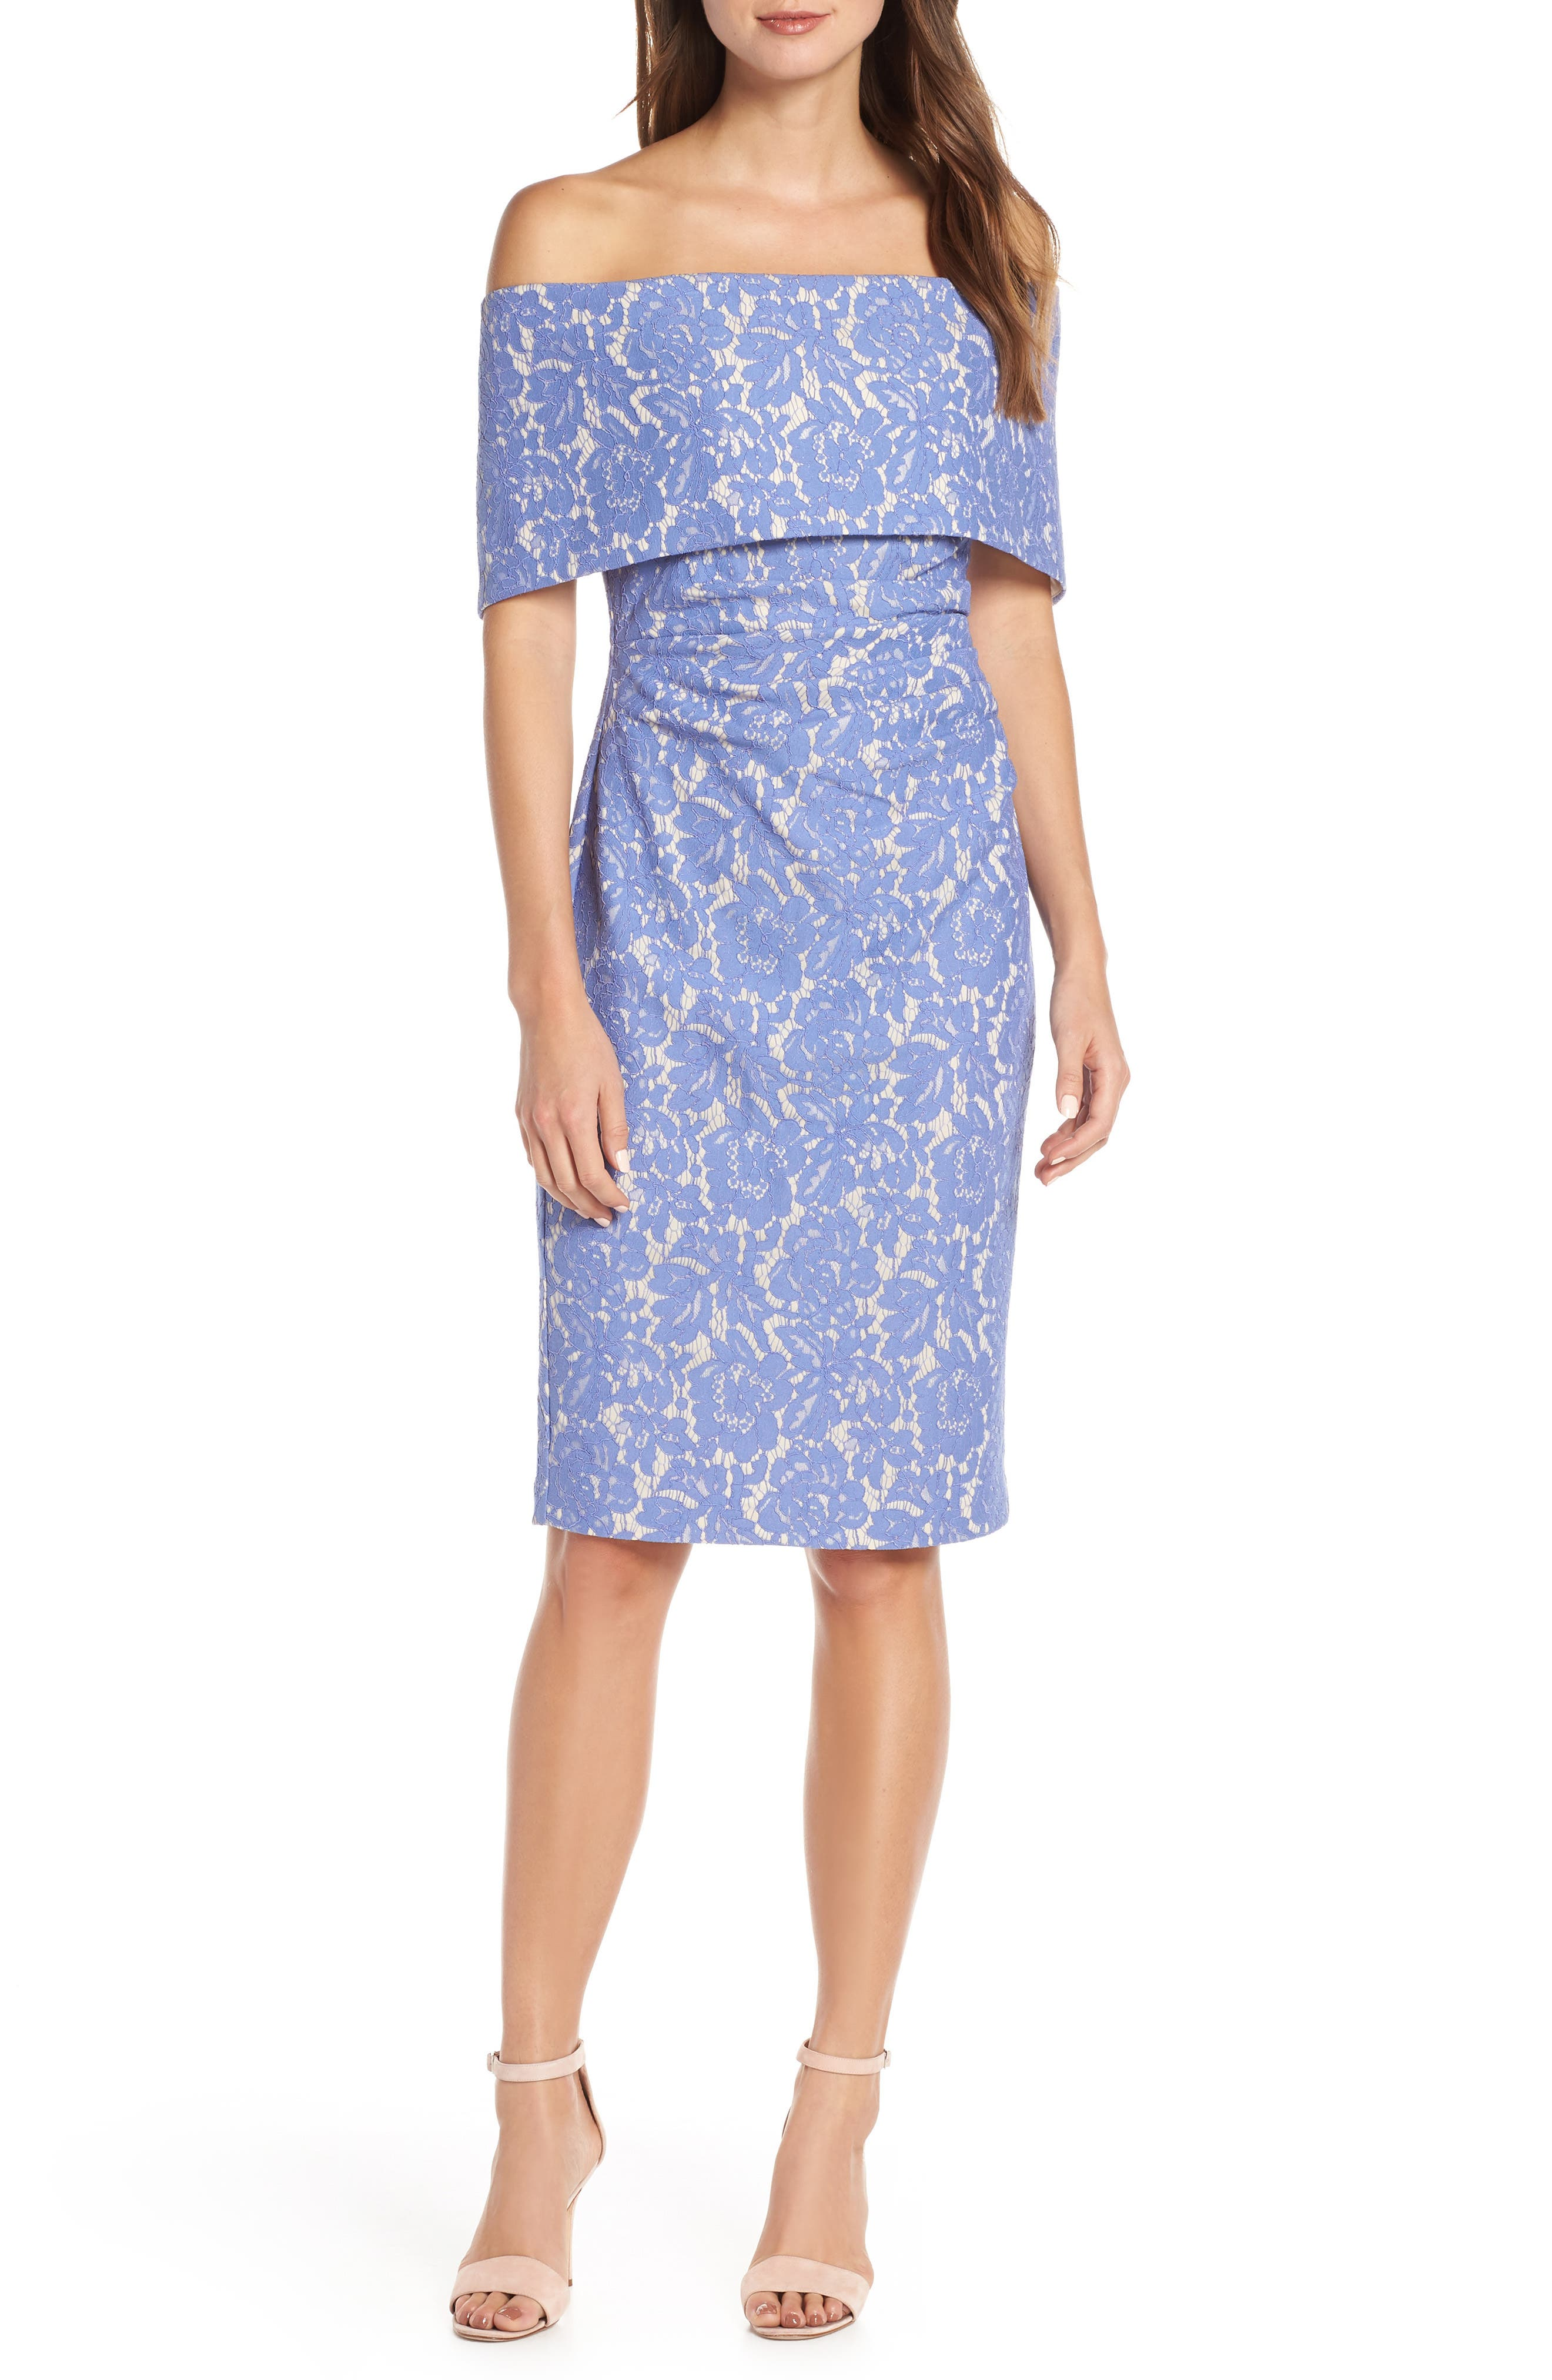 VINCE CAMUTO,                             Off the Shoulder Lace Sheath Dress,                             Main thumbnail 1, color,                             PERIWINKLE